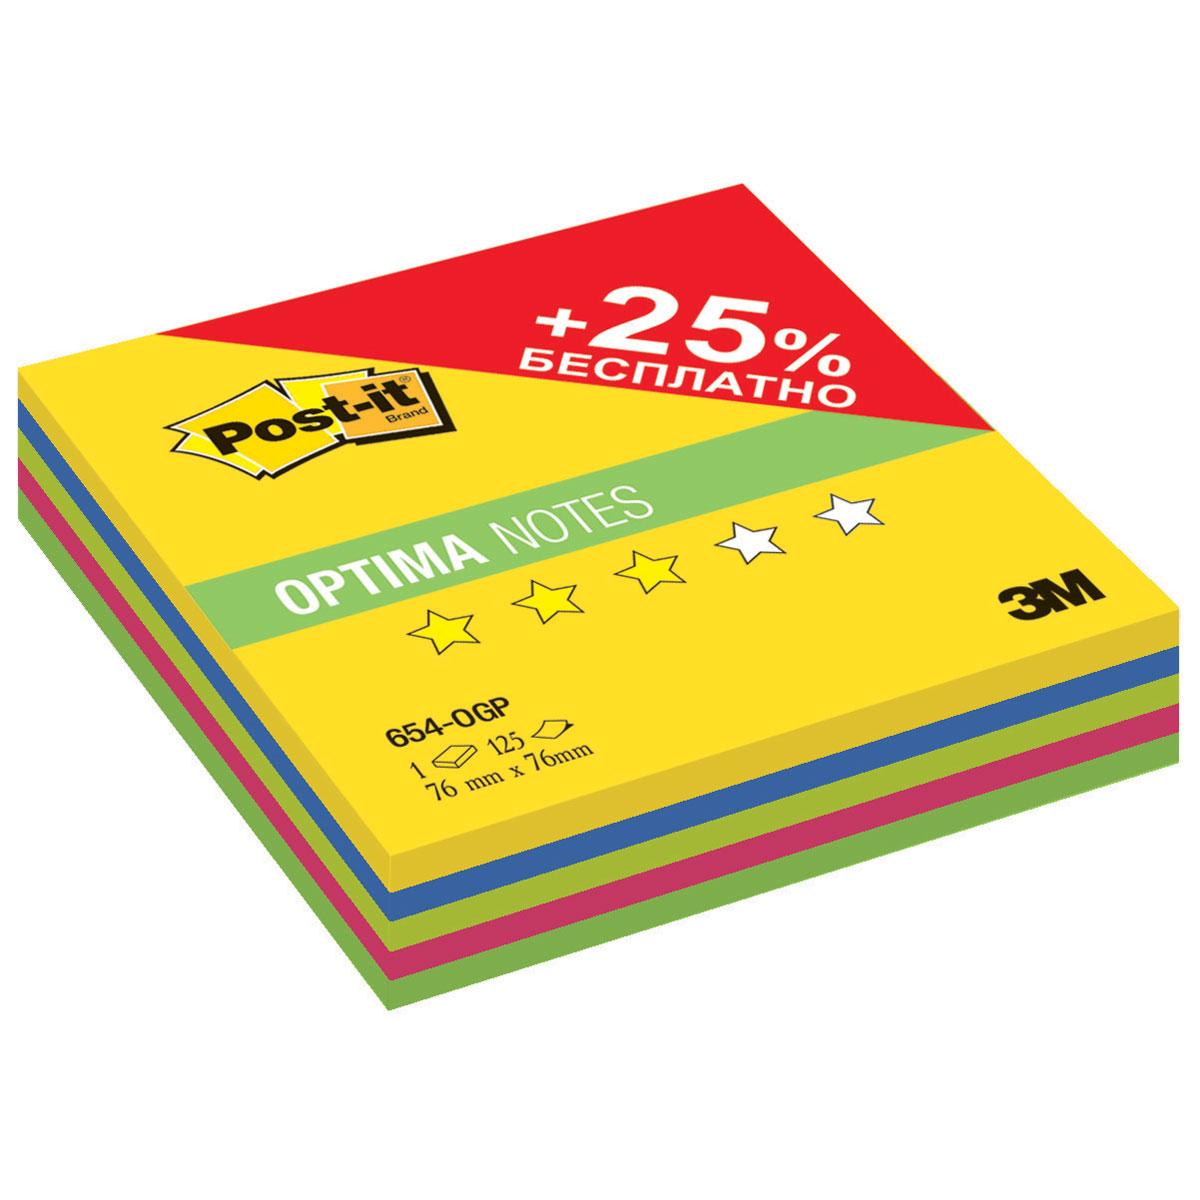 Post-it Бумага для заметок с липким слоем 125 листов 654-OGP